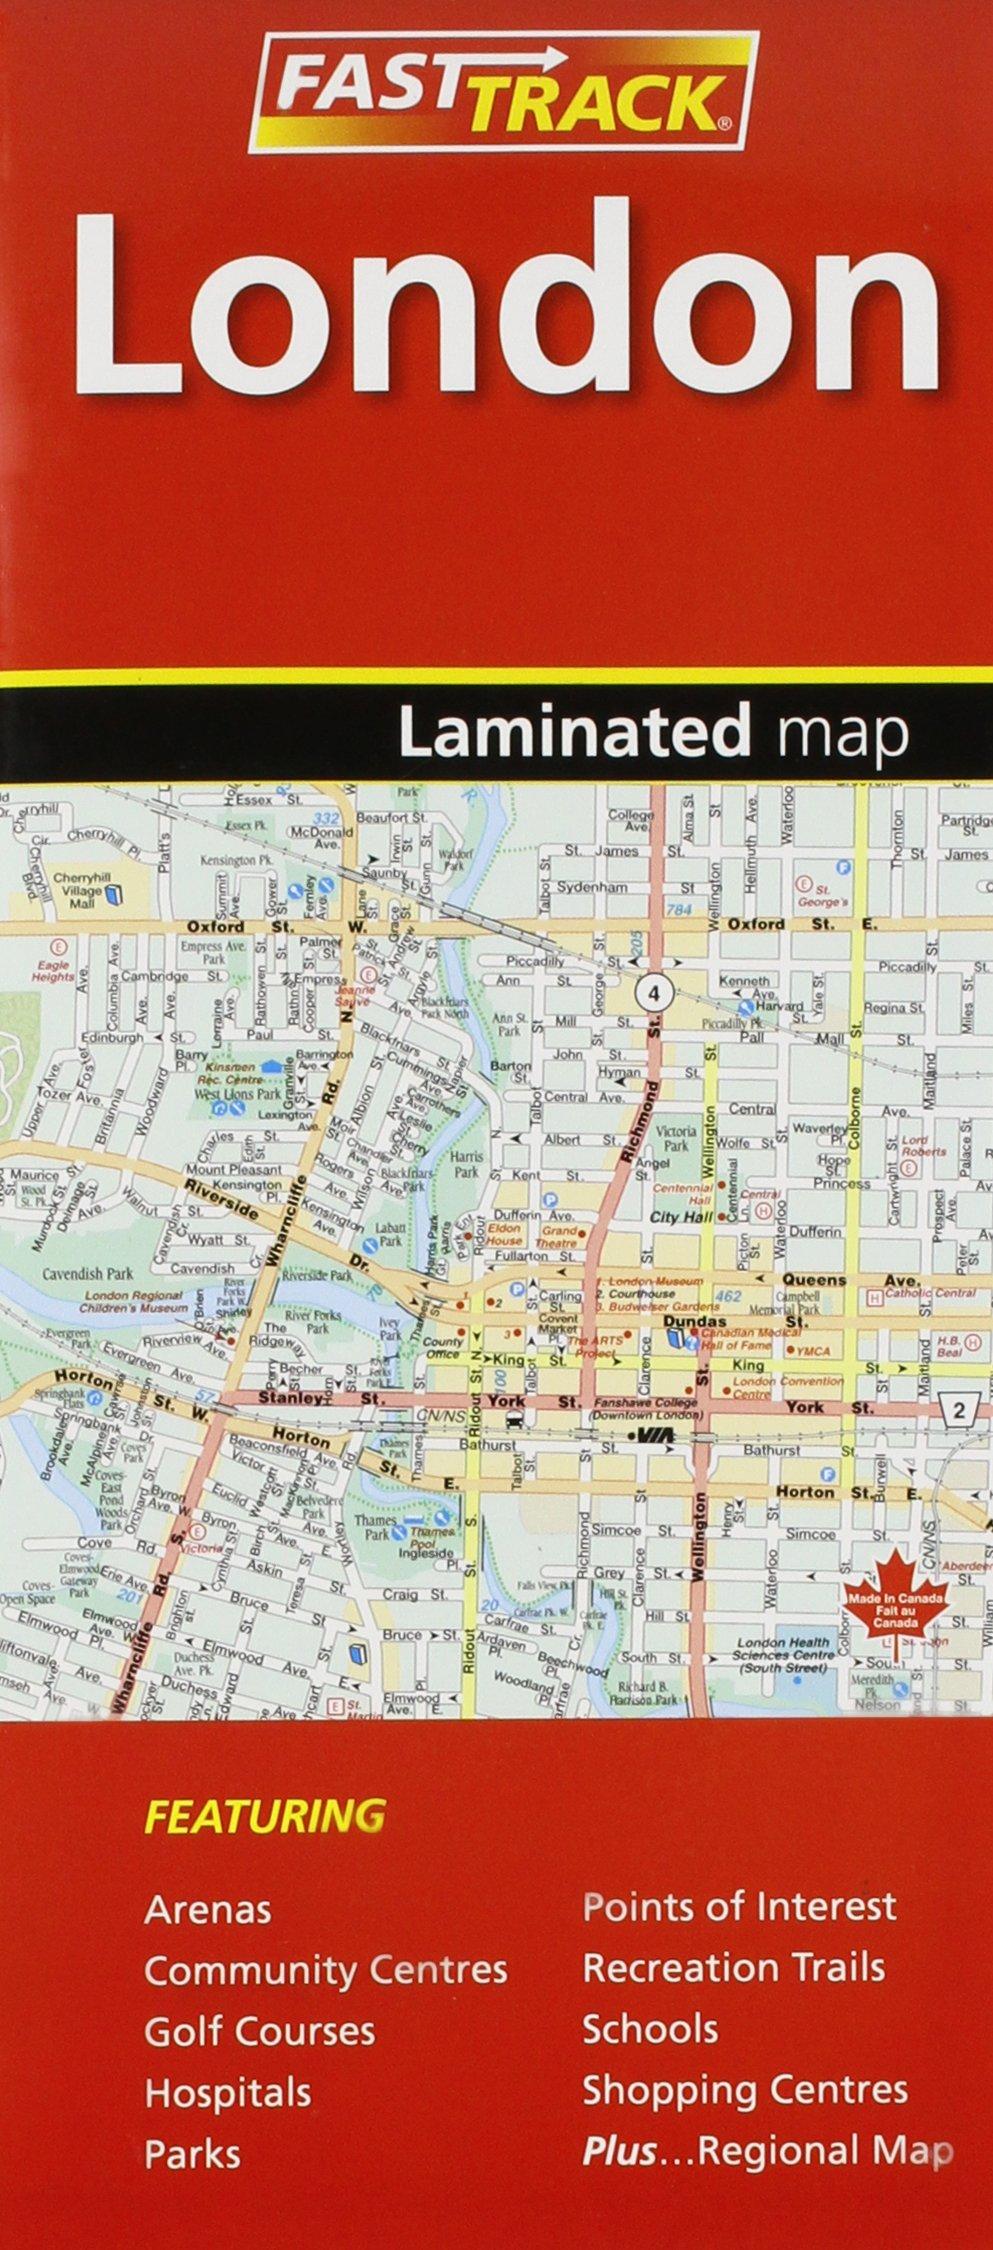 London Ontario Laminated Fast Track Map Mapart Mapart Mapart 9781553681922 Amazon Com Books